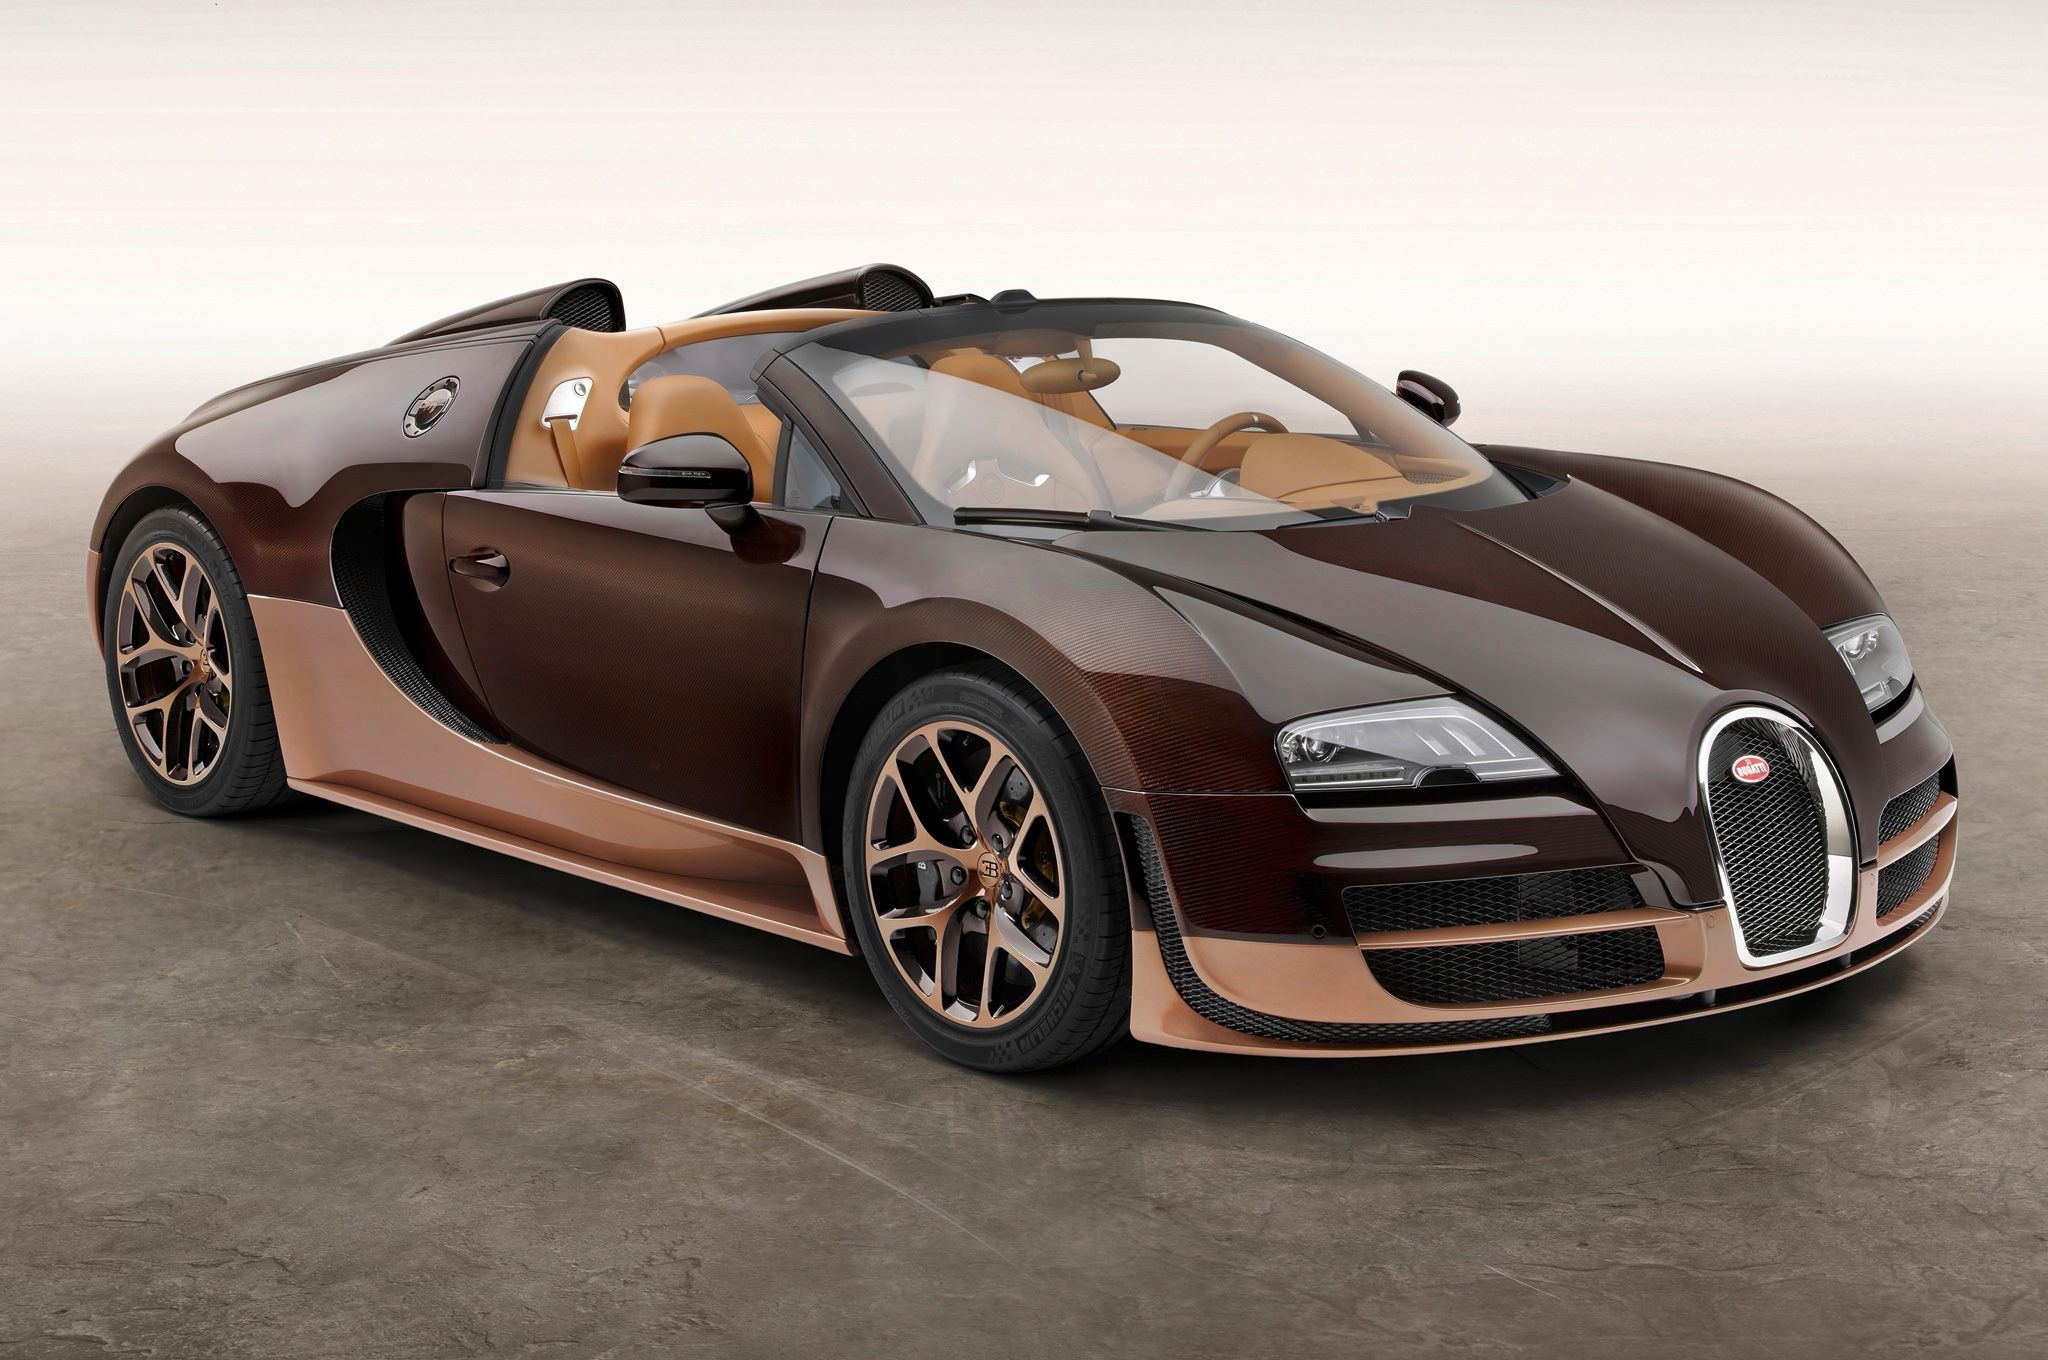 3376bc1823708105791d21118ad58de9 Remarkable Bugatti Veyron Grand Sport Vitesse Informacion Cars Trend